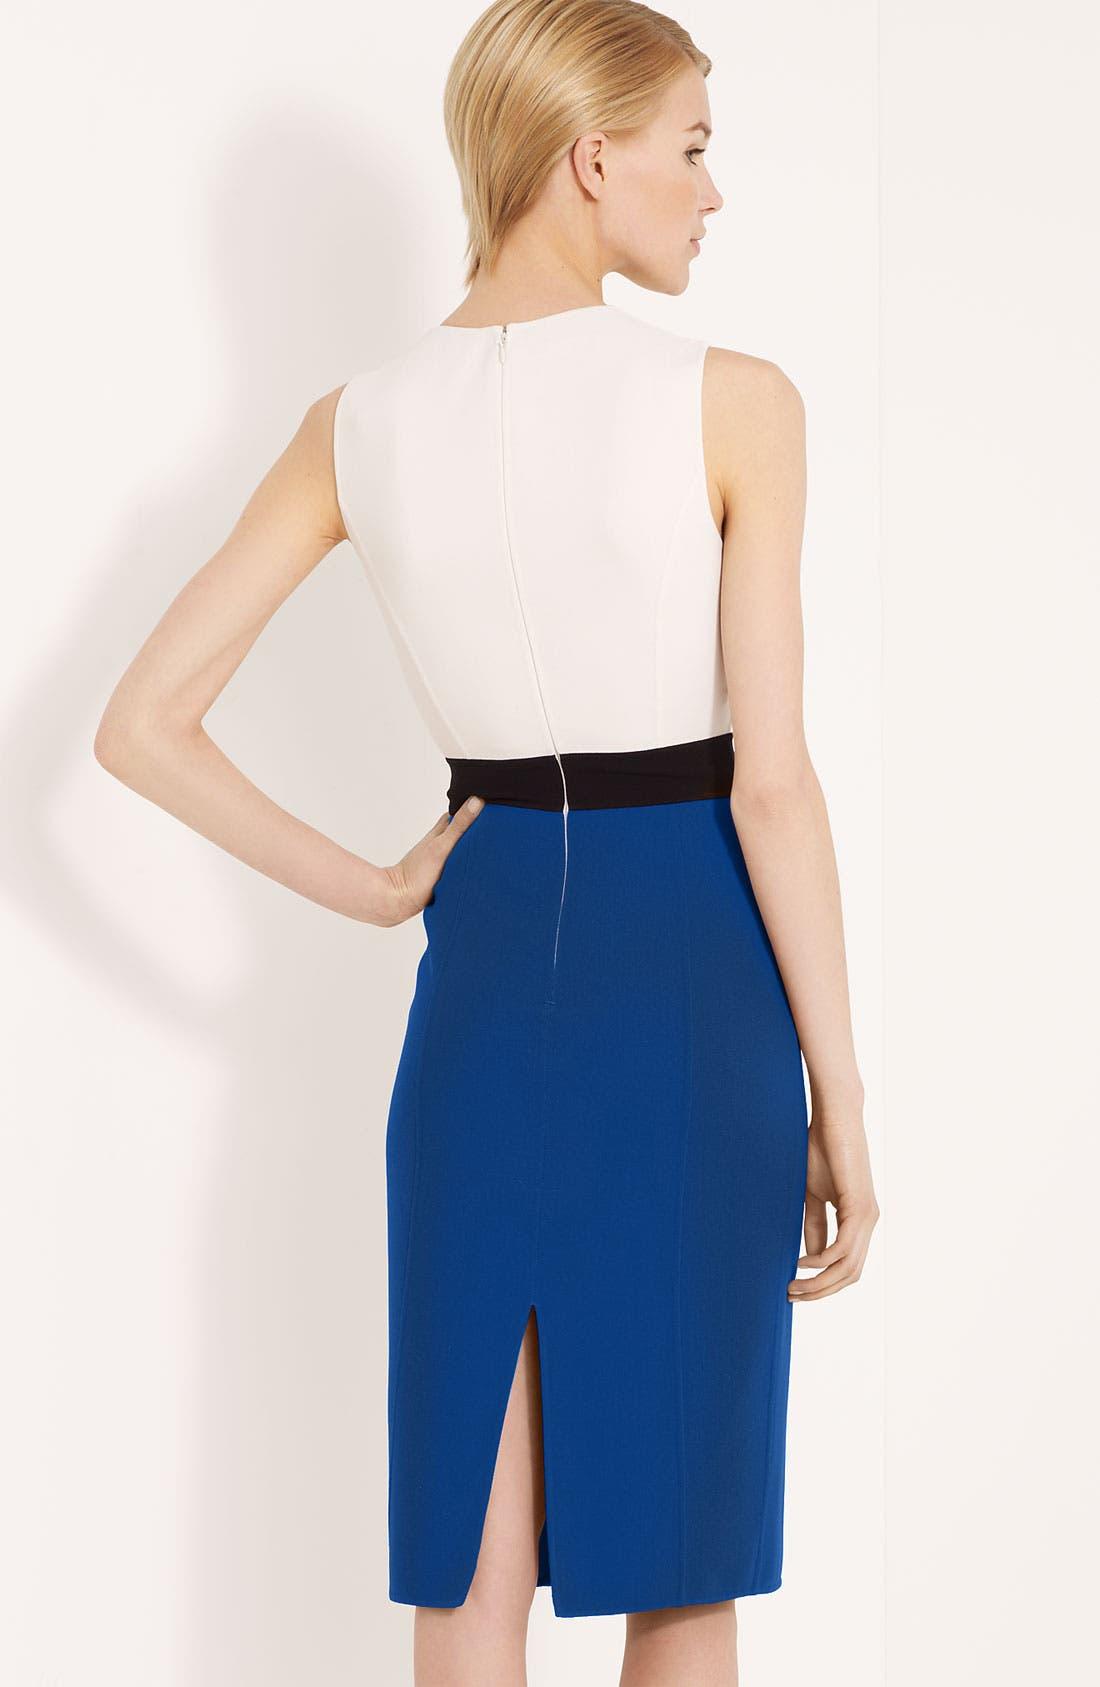 Alternate Image 2  - Michael Kors Colorblock Stretch Wool Crepe Dress